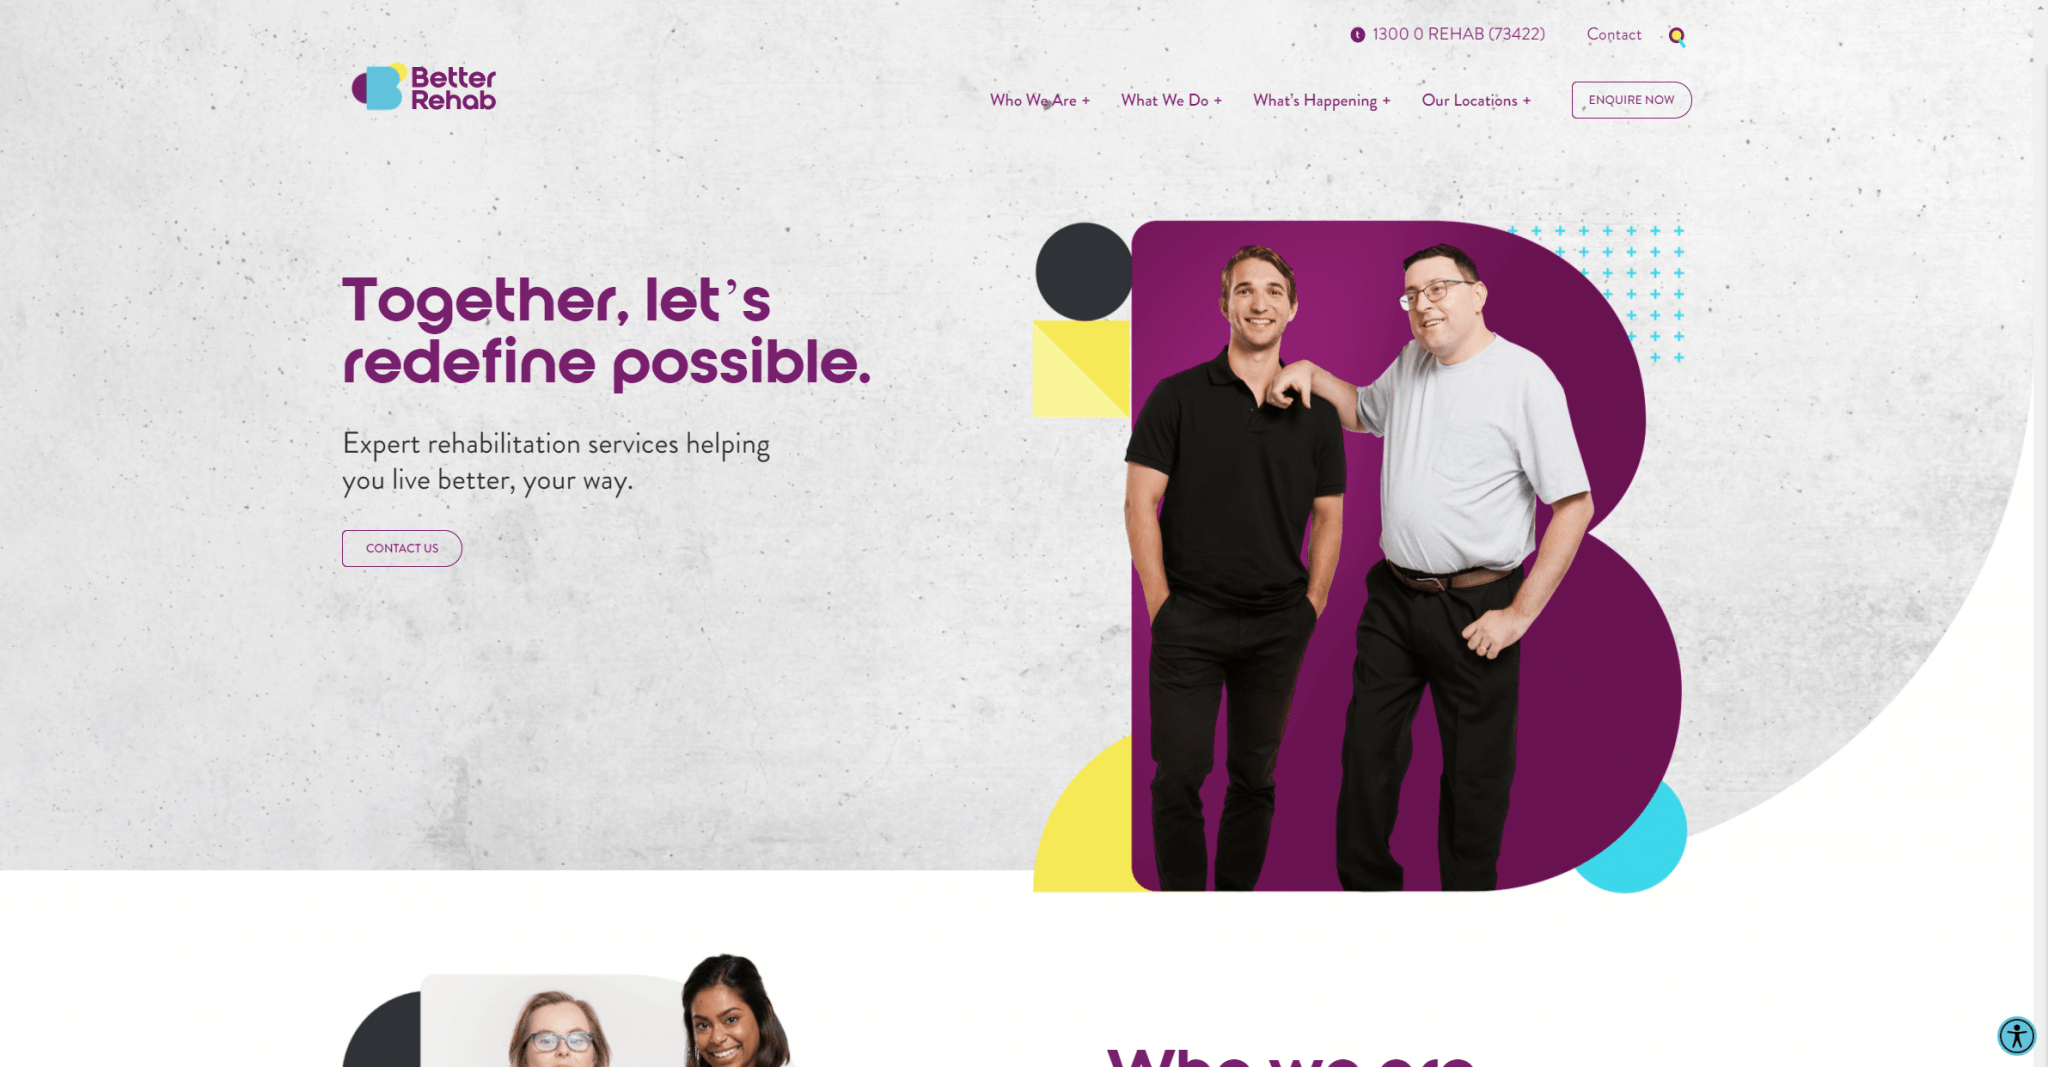 betterrehab.com.au